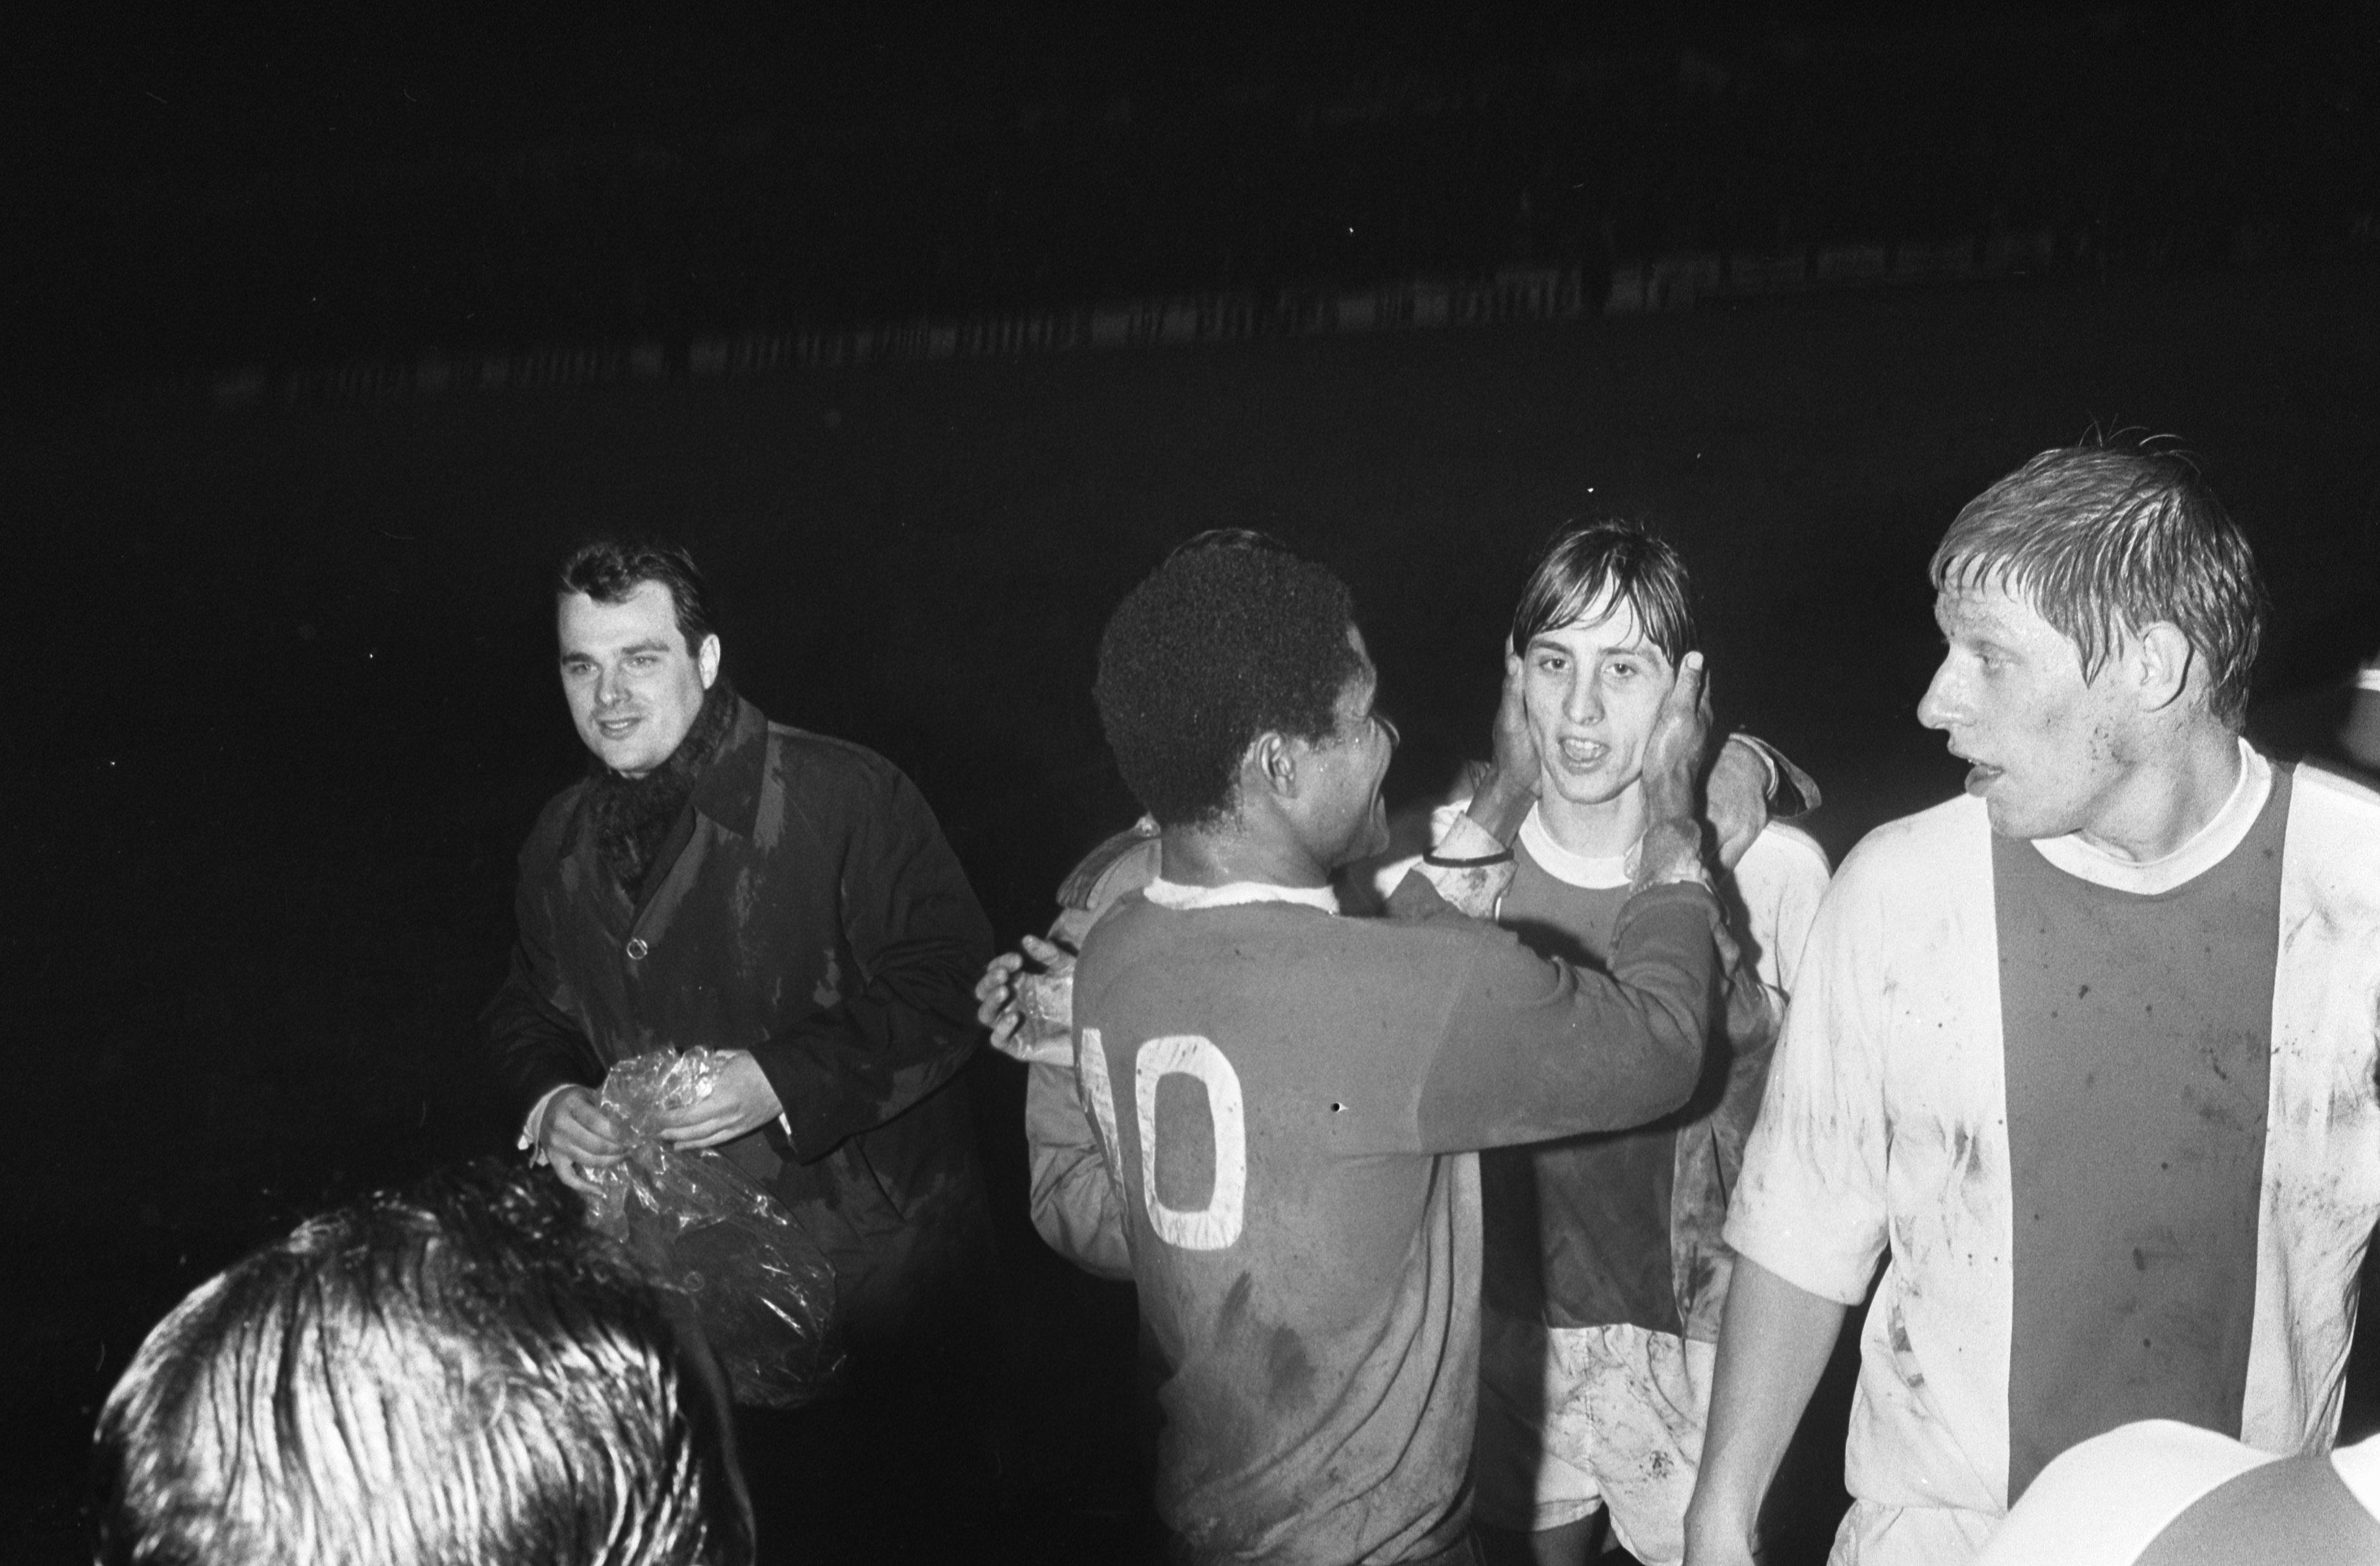 Storia del calcio portoghese. Eusébio si congratula con Johan Cruijff dopo un match tra Benfica e Ajax del 1969